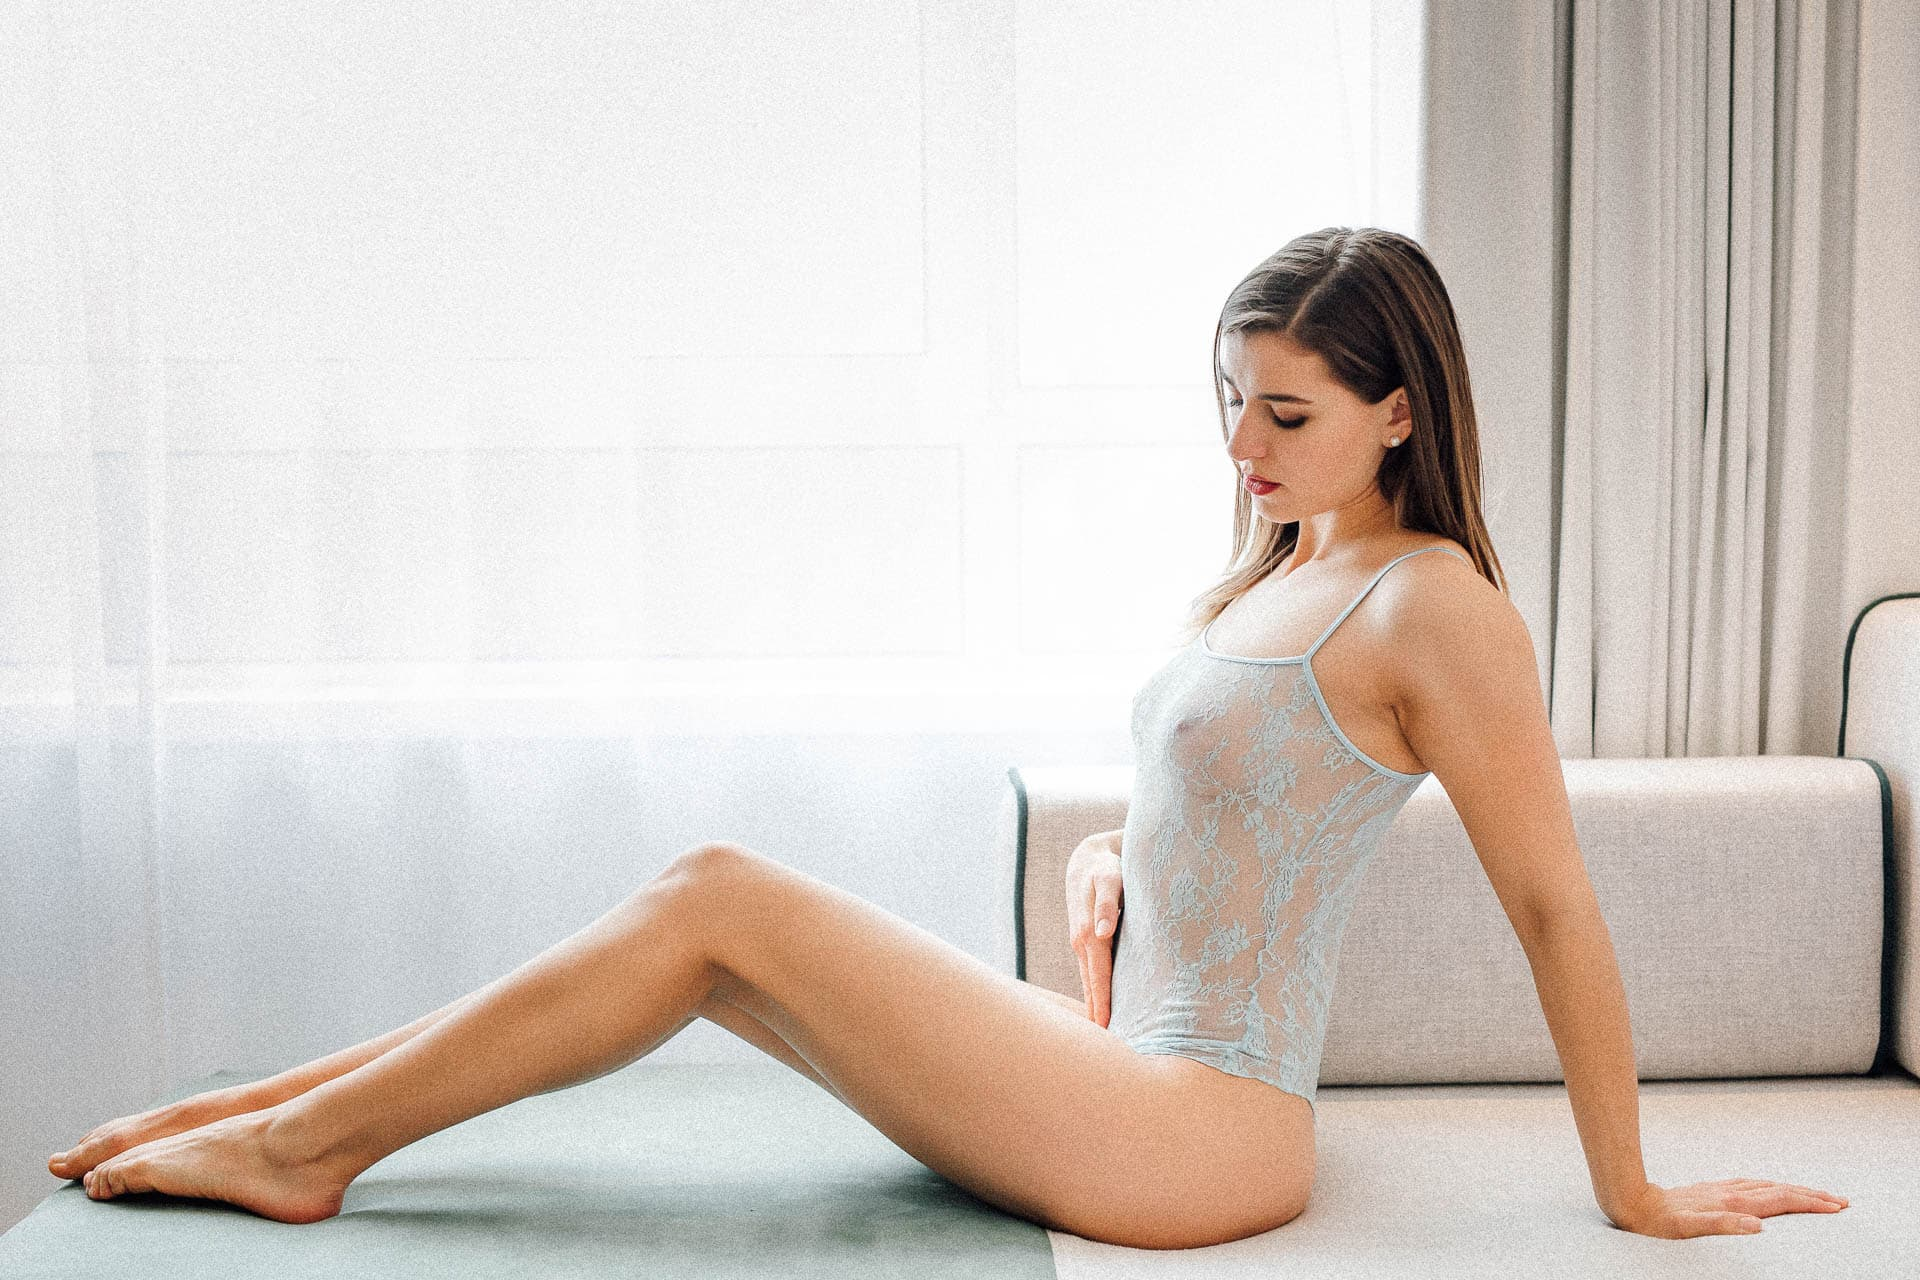 boudoir-fotografie-model-sitzend-auf-einem-sofa-in-desouse